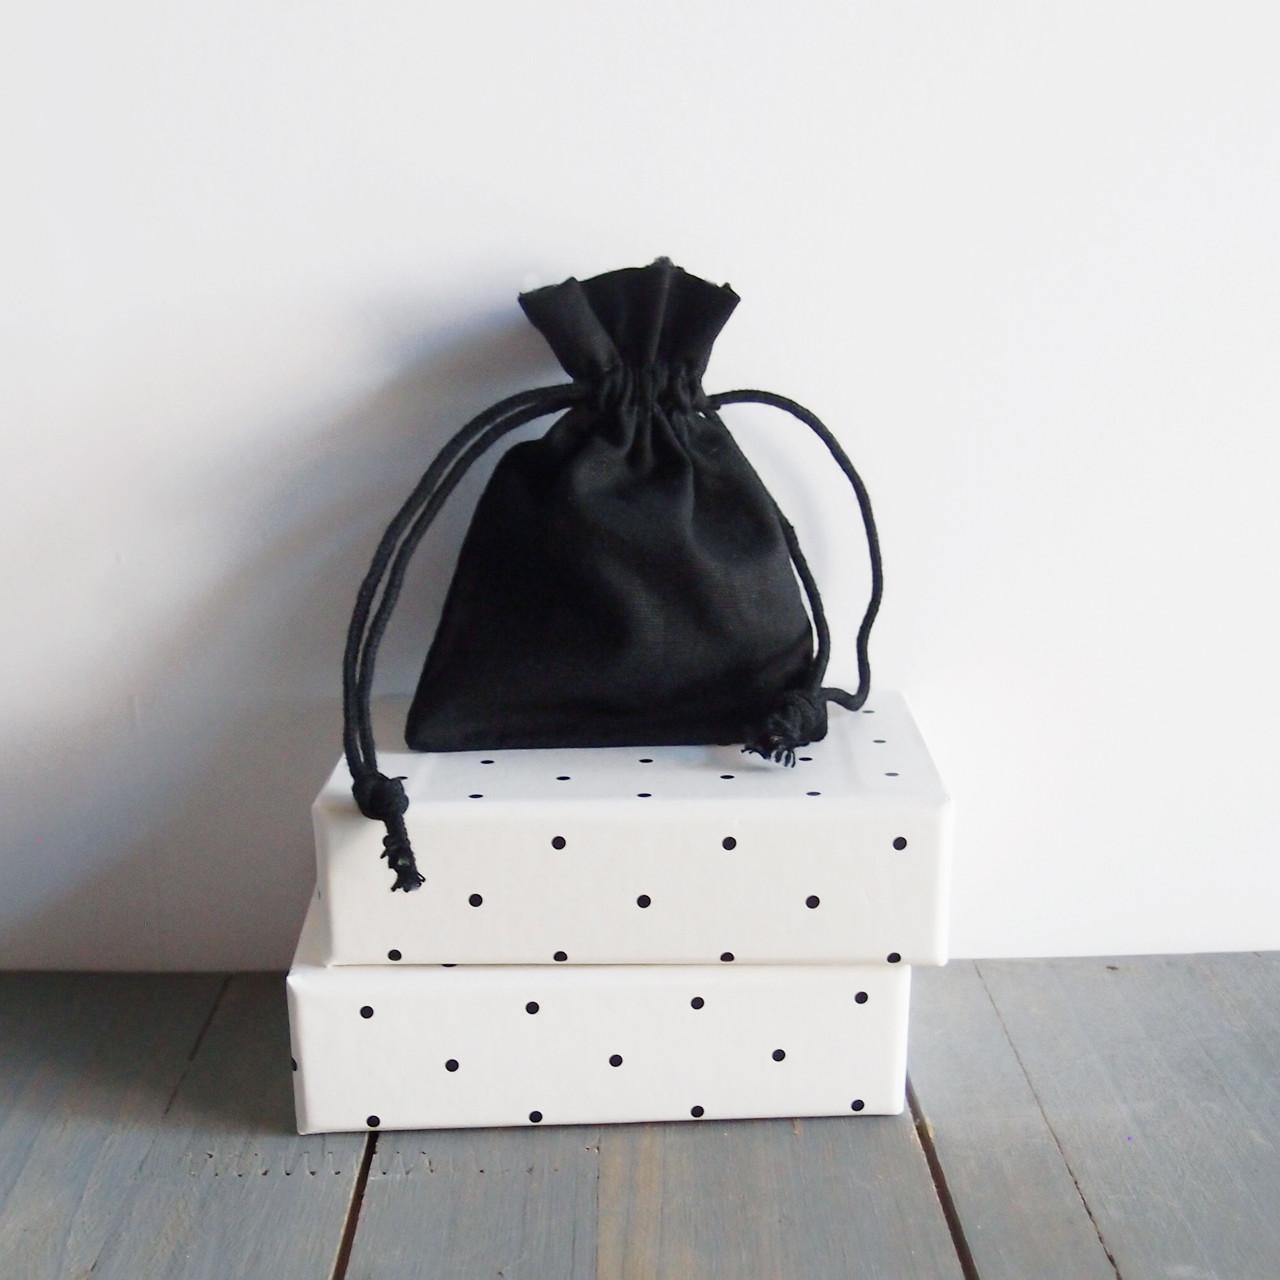 Black Cotton Drawstring Bags 3 x 4 inches, Wholesale Black Drawstring Bags | Packaging Decor